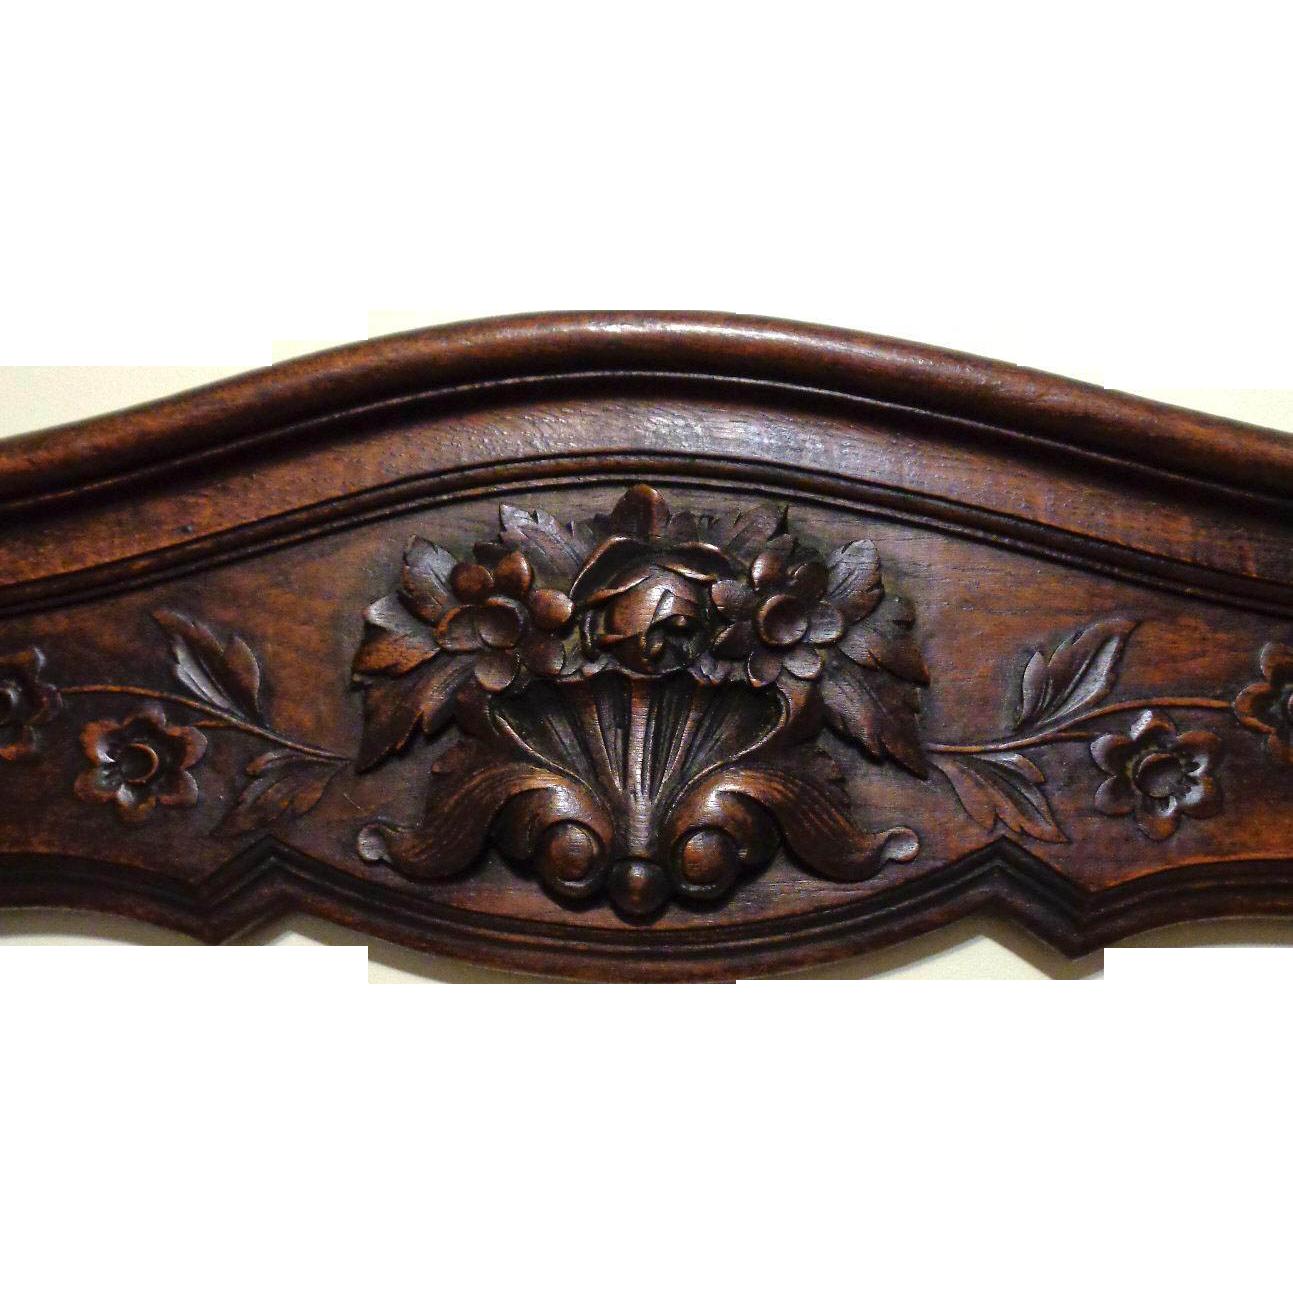 19th Century Antique French Provencal Oak Crest.